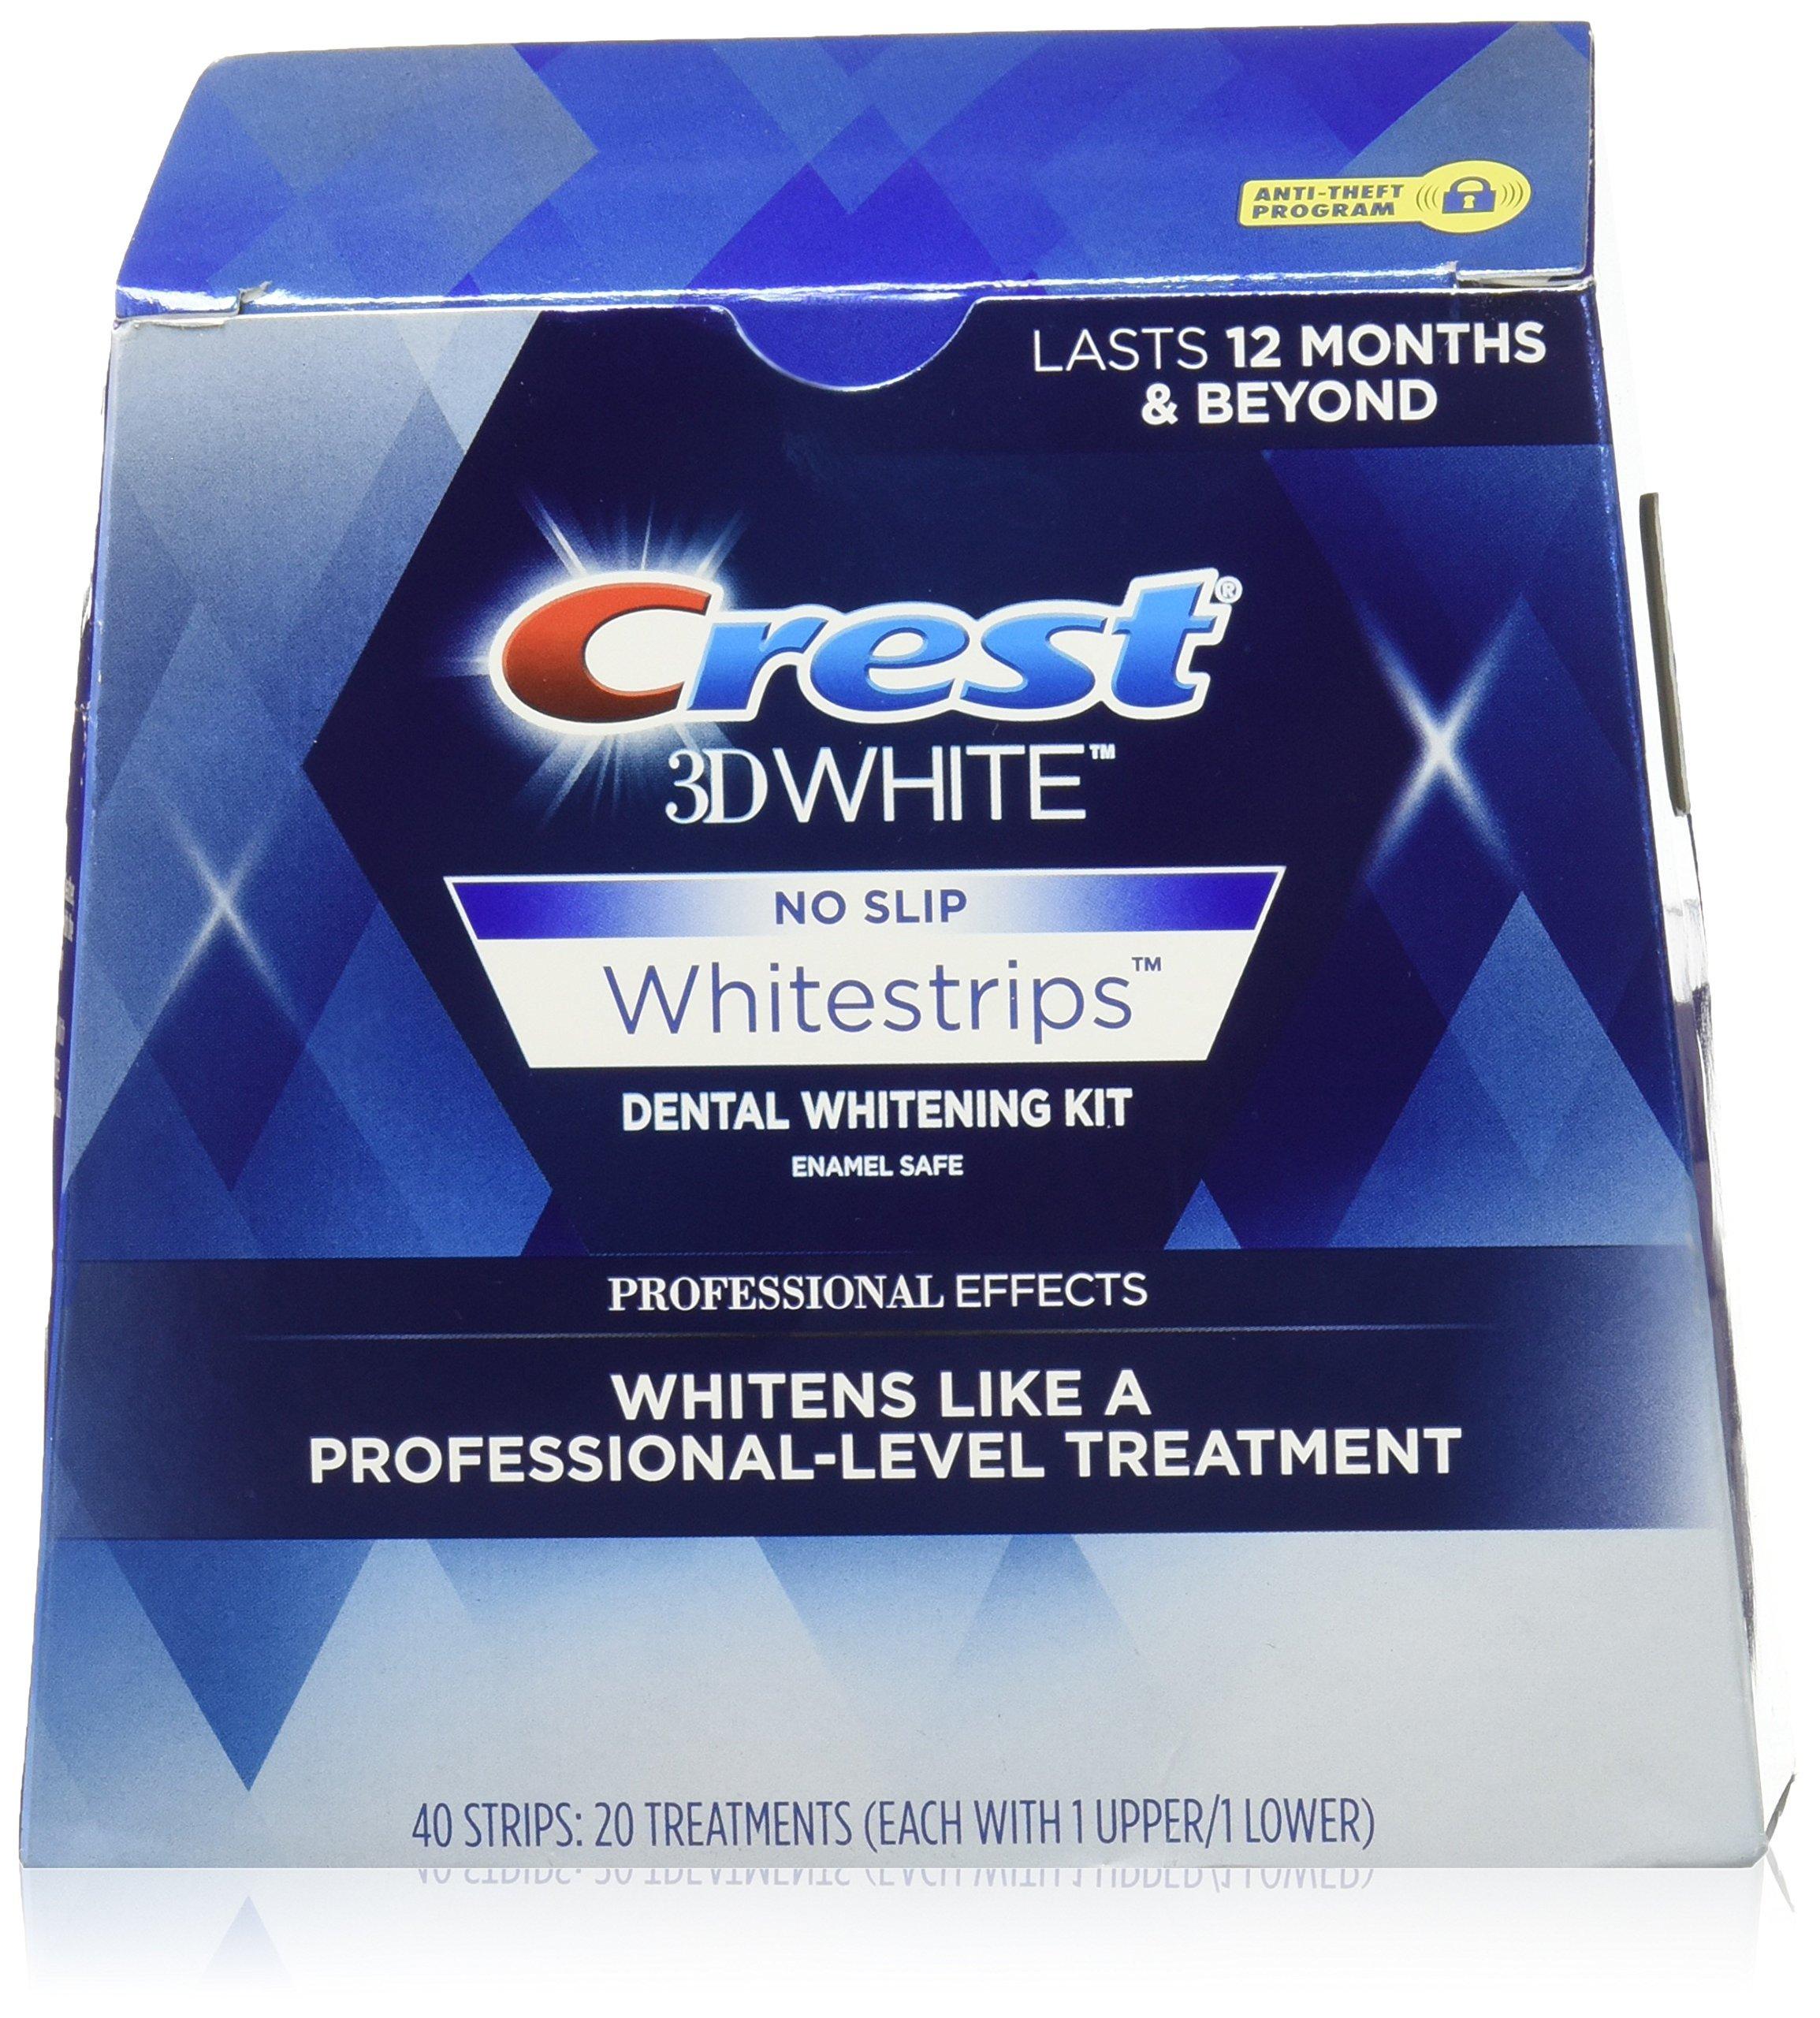 Amazon.com : Crest 3D Luxe Whitestrips Professional